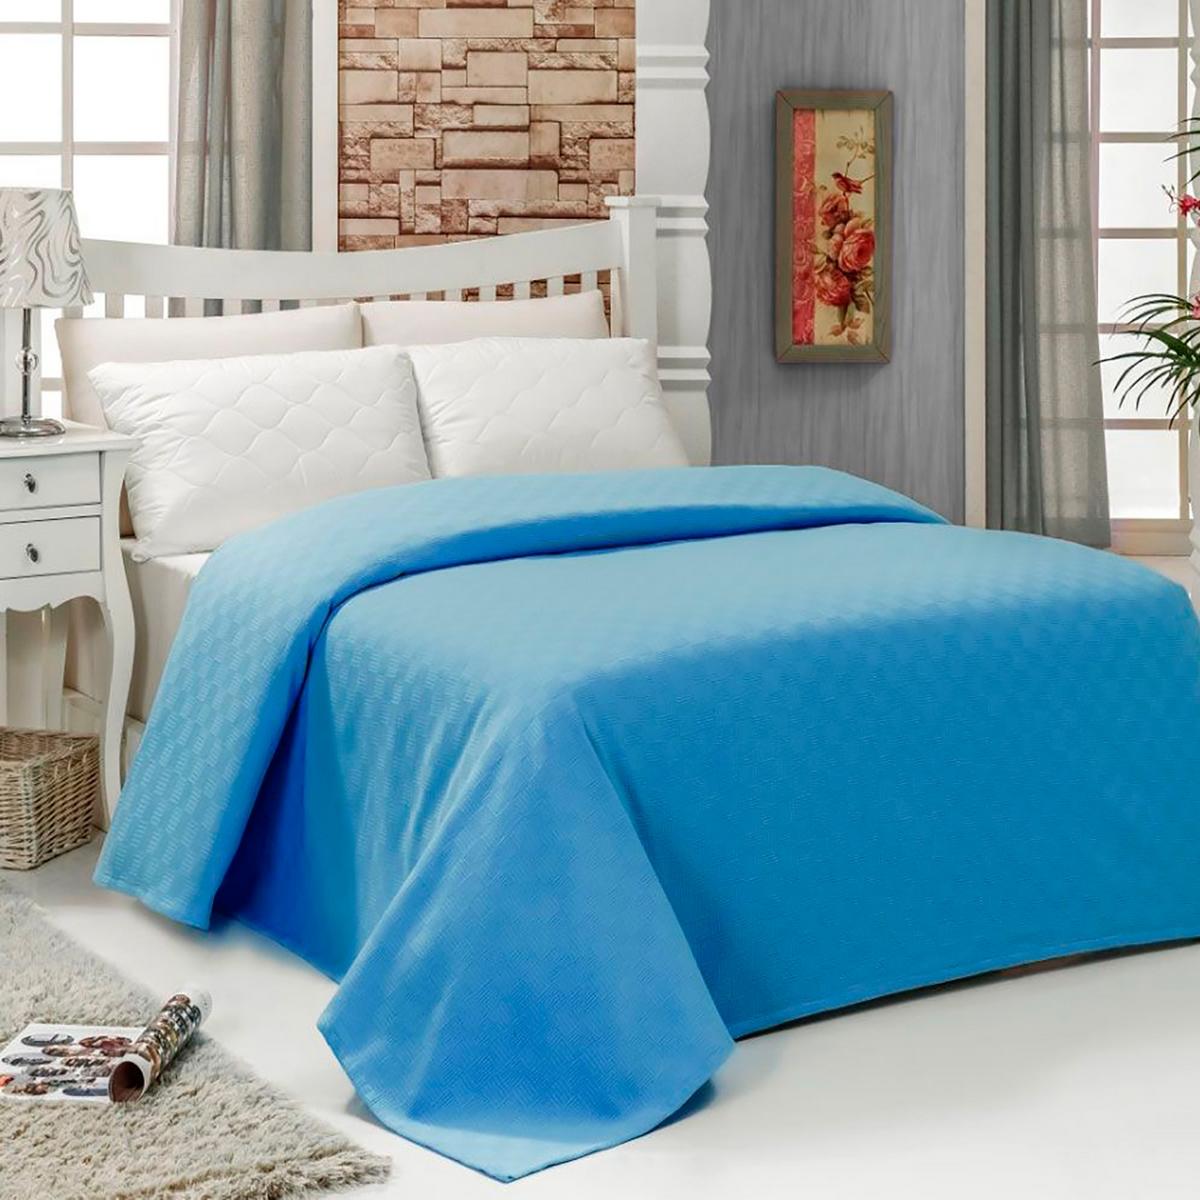 Покрывало Arya home collection Sude, голубой пике женский mk2573 03 голубой